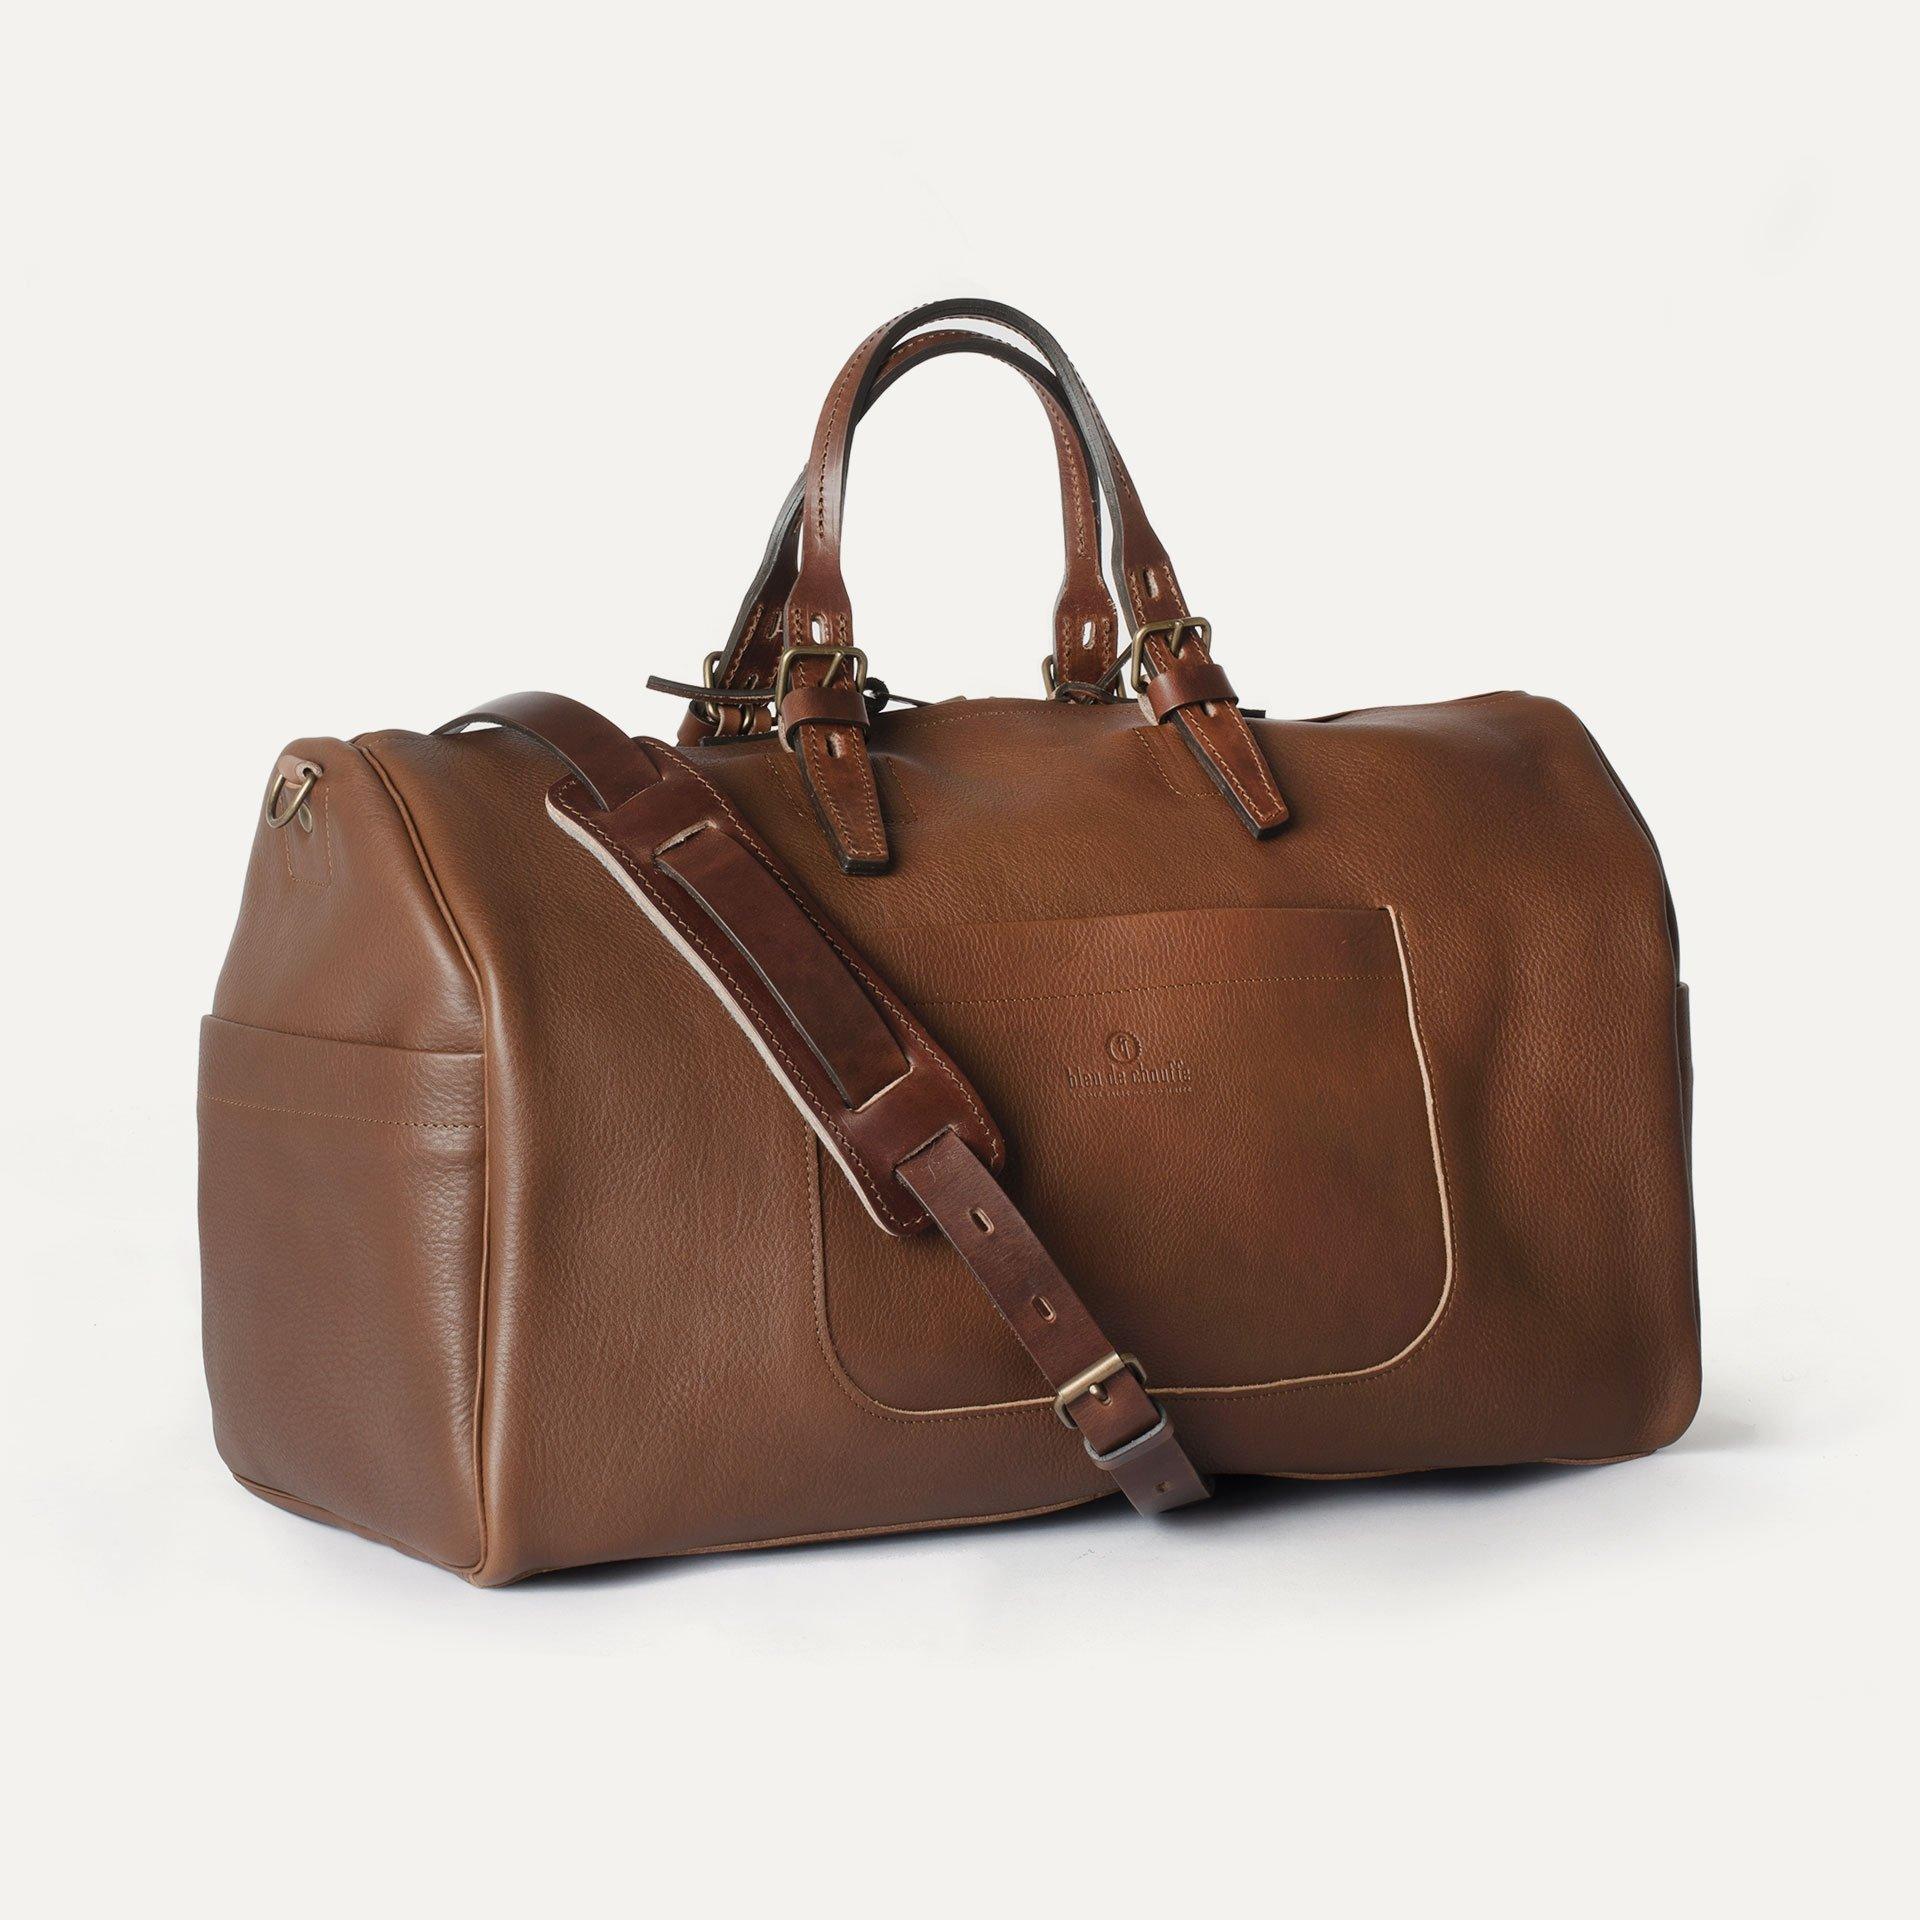 Hobo Travel bag - Cuba Libre (image n°2)